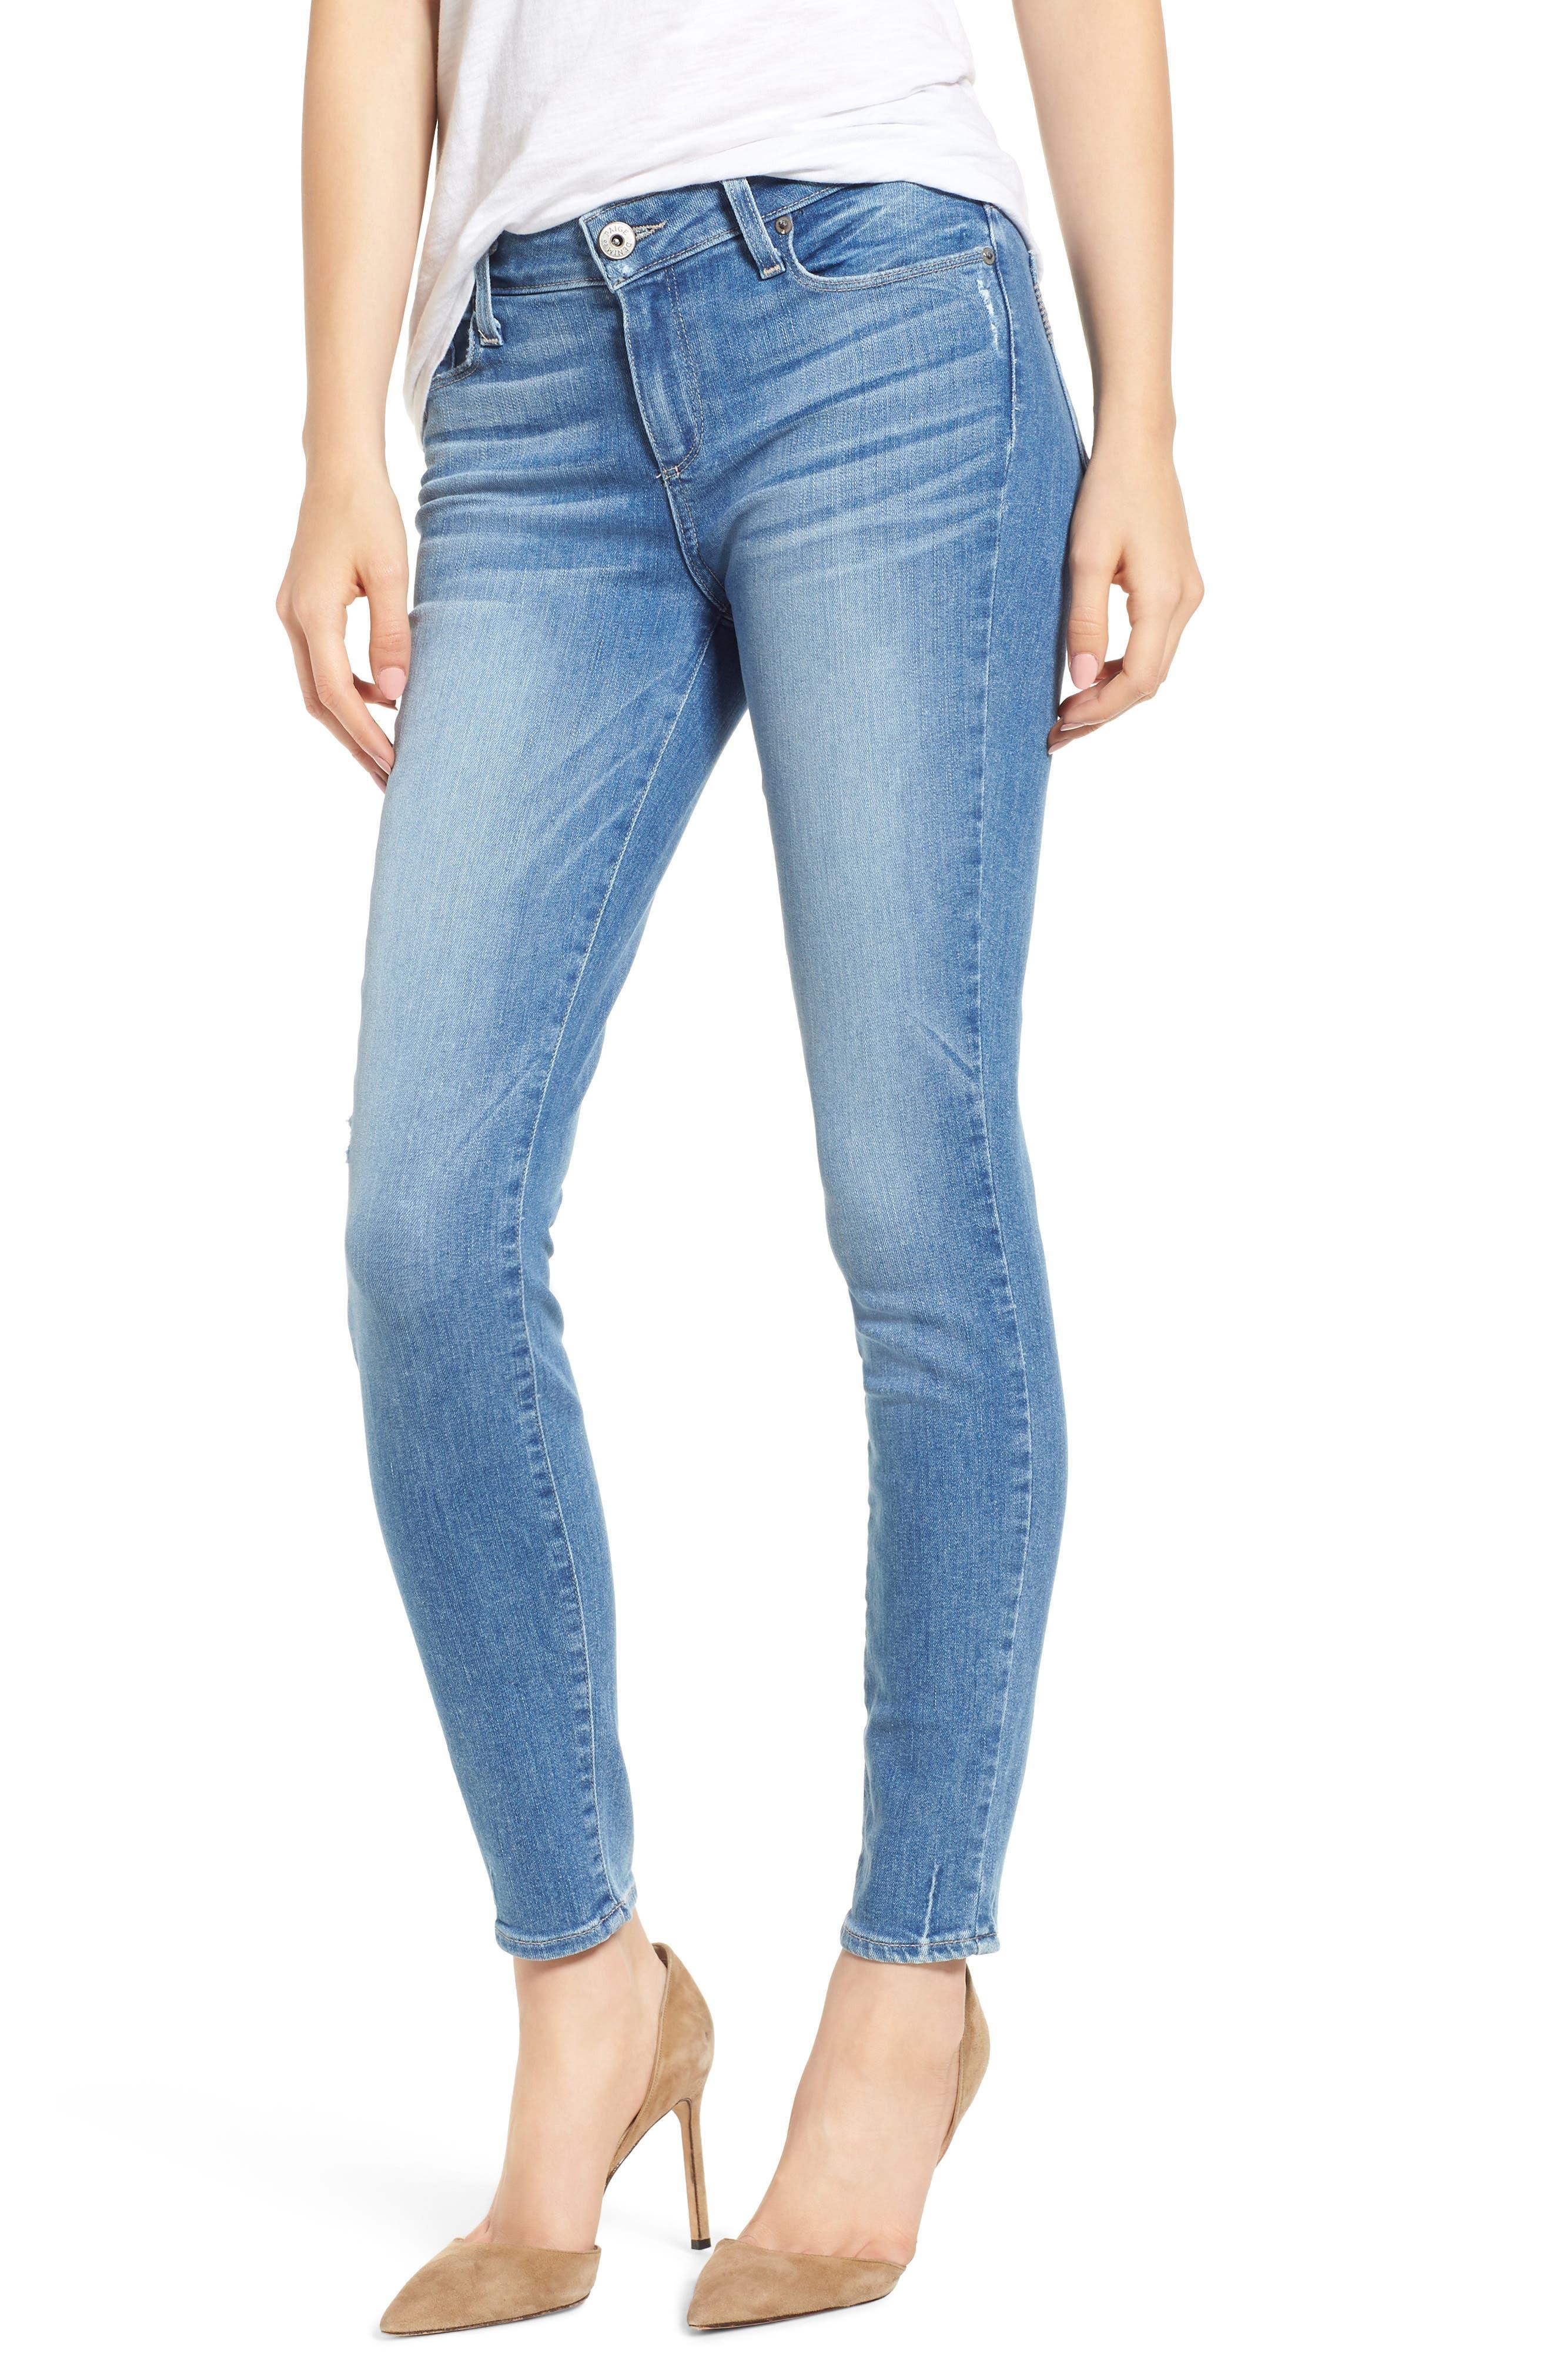 PAIGE Transcend Vintage - Verdugo Ultra Skinny Jeans (Atterbury) (Petite)